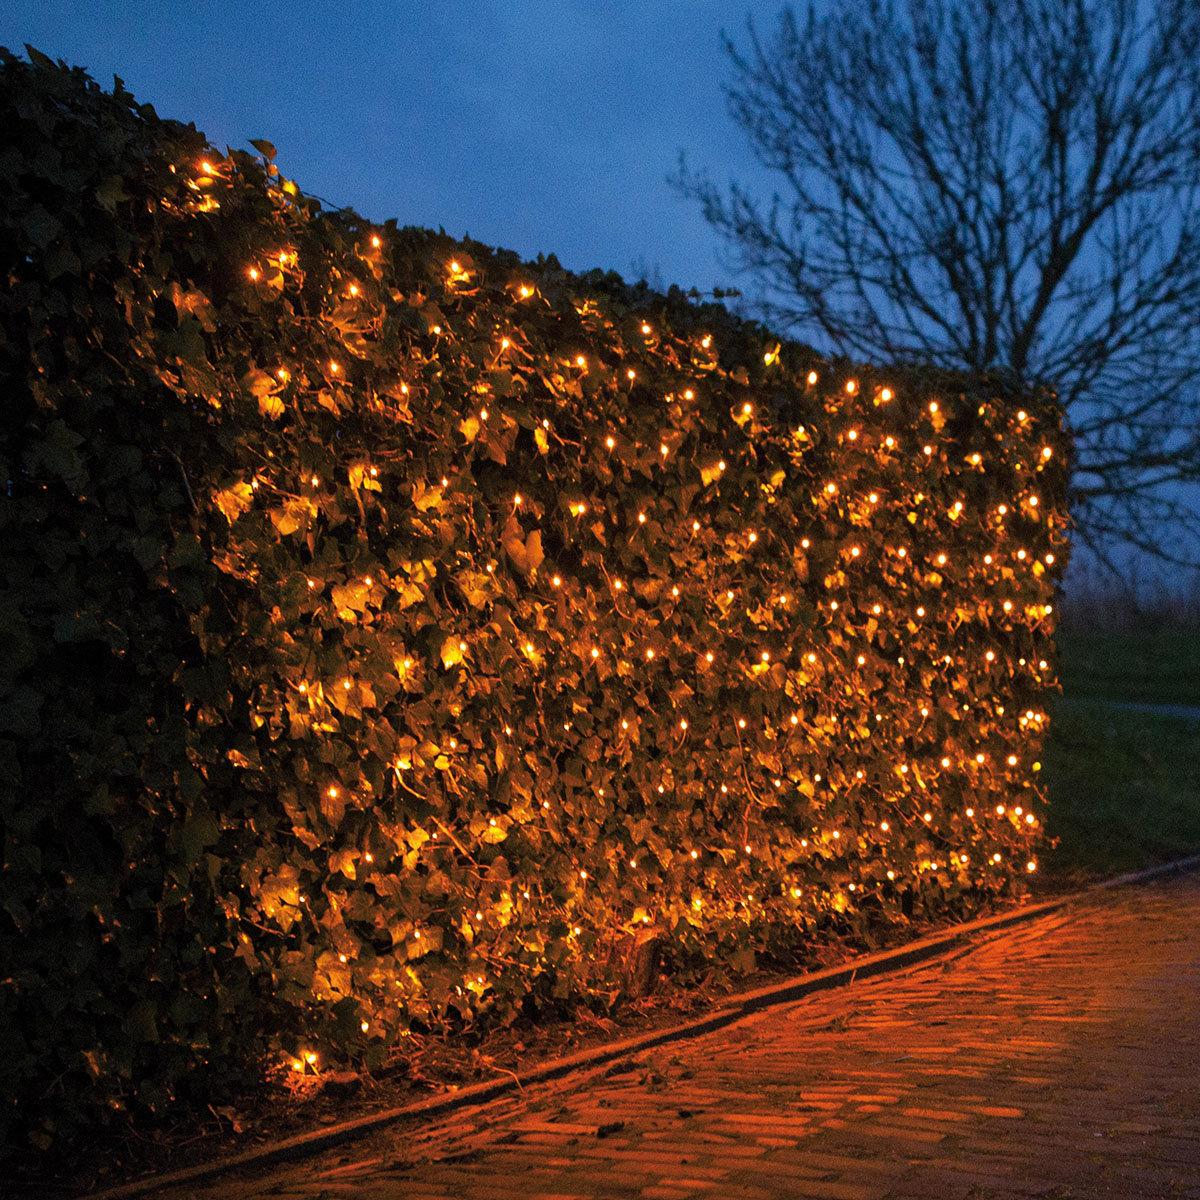 LED-Lichternetz, 240 LEDs, 200x200 cm, weiß